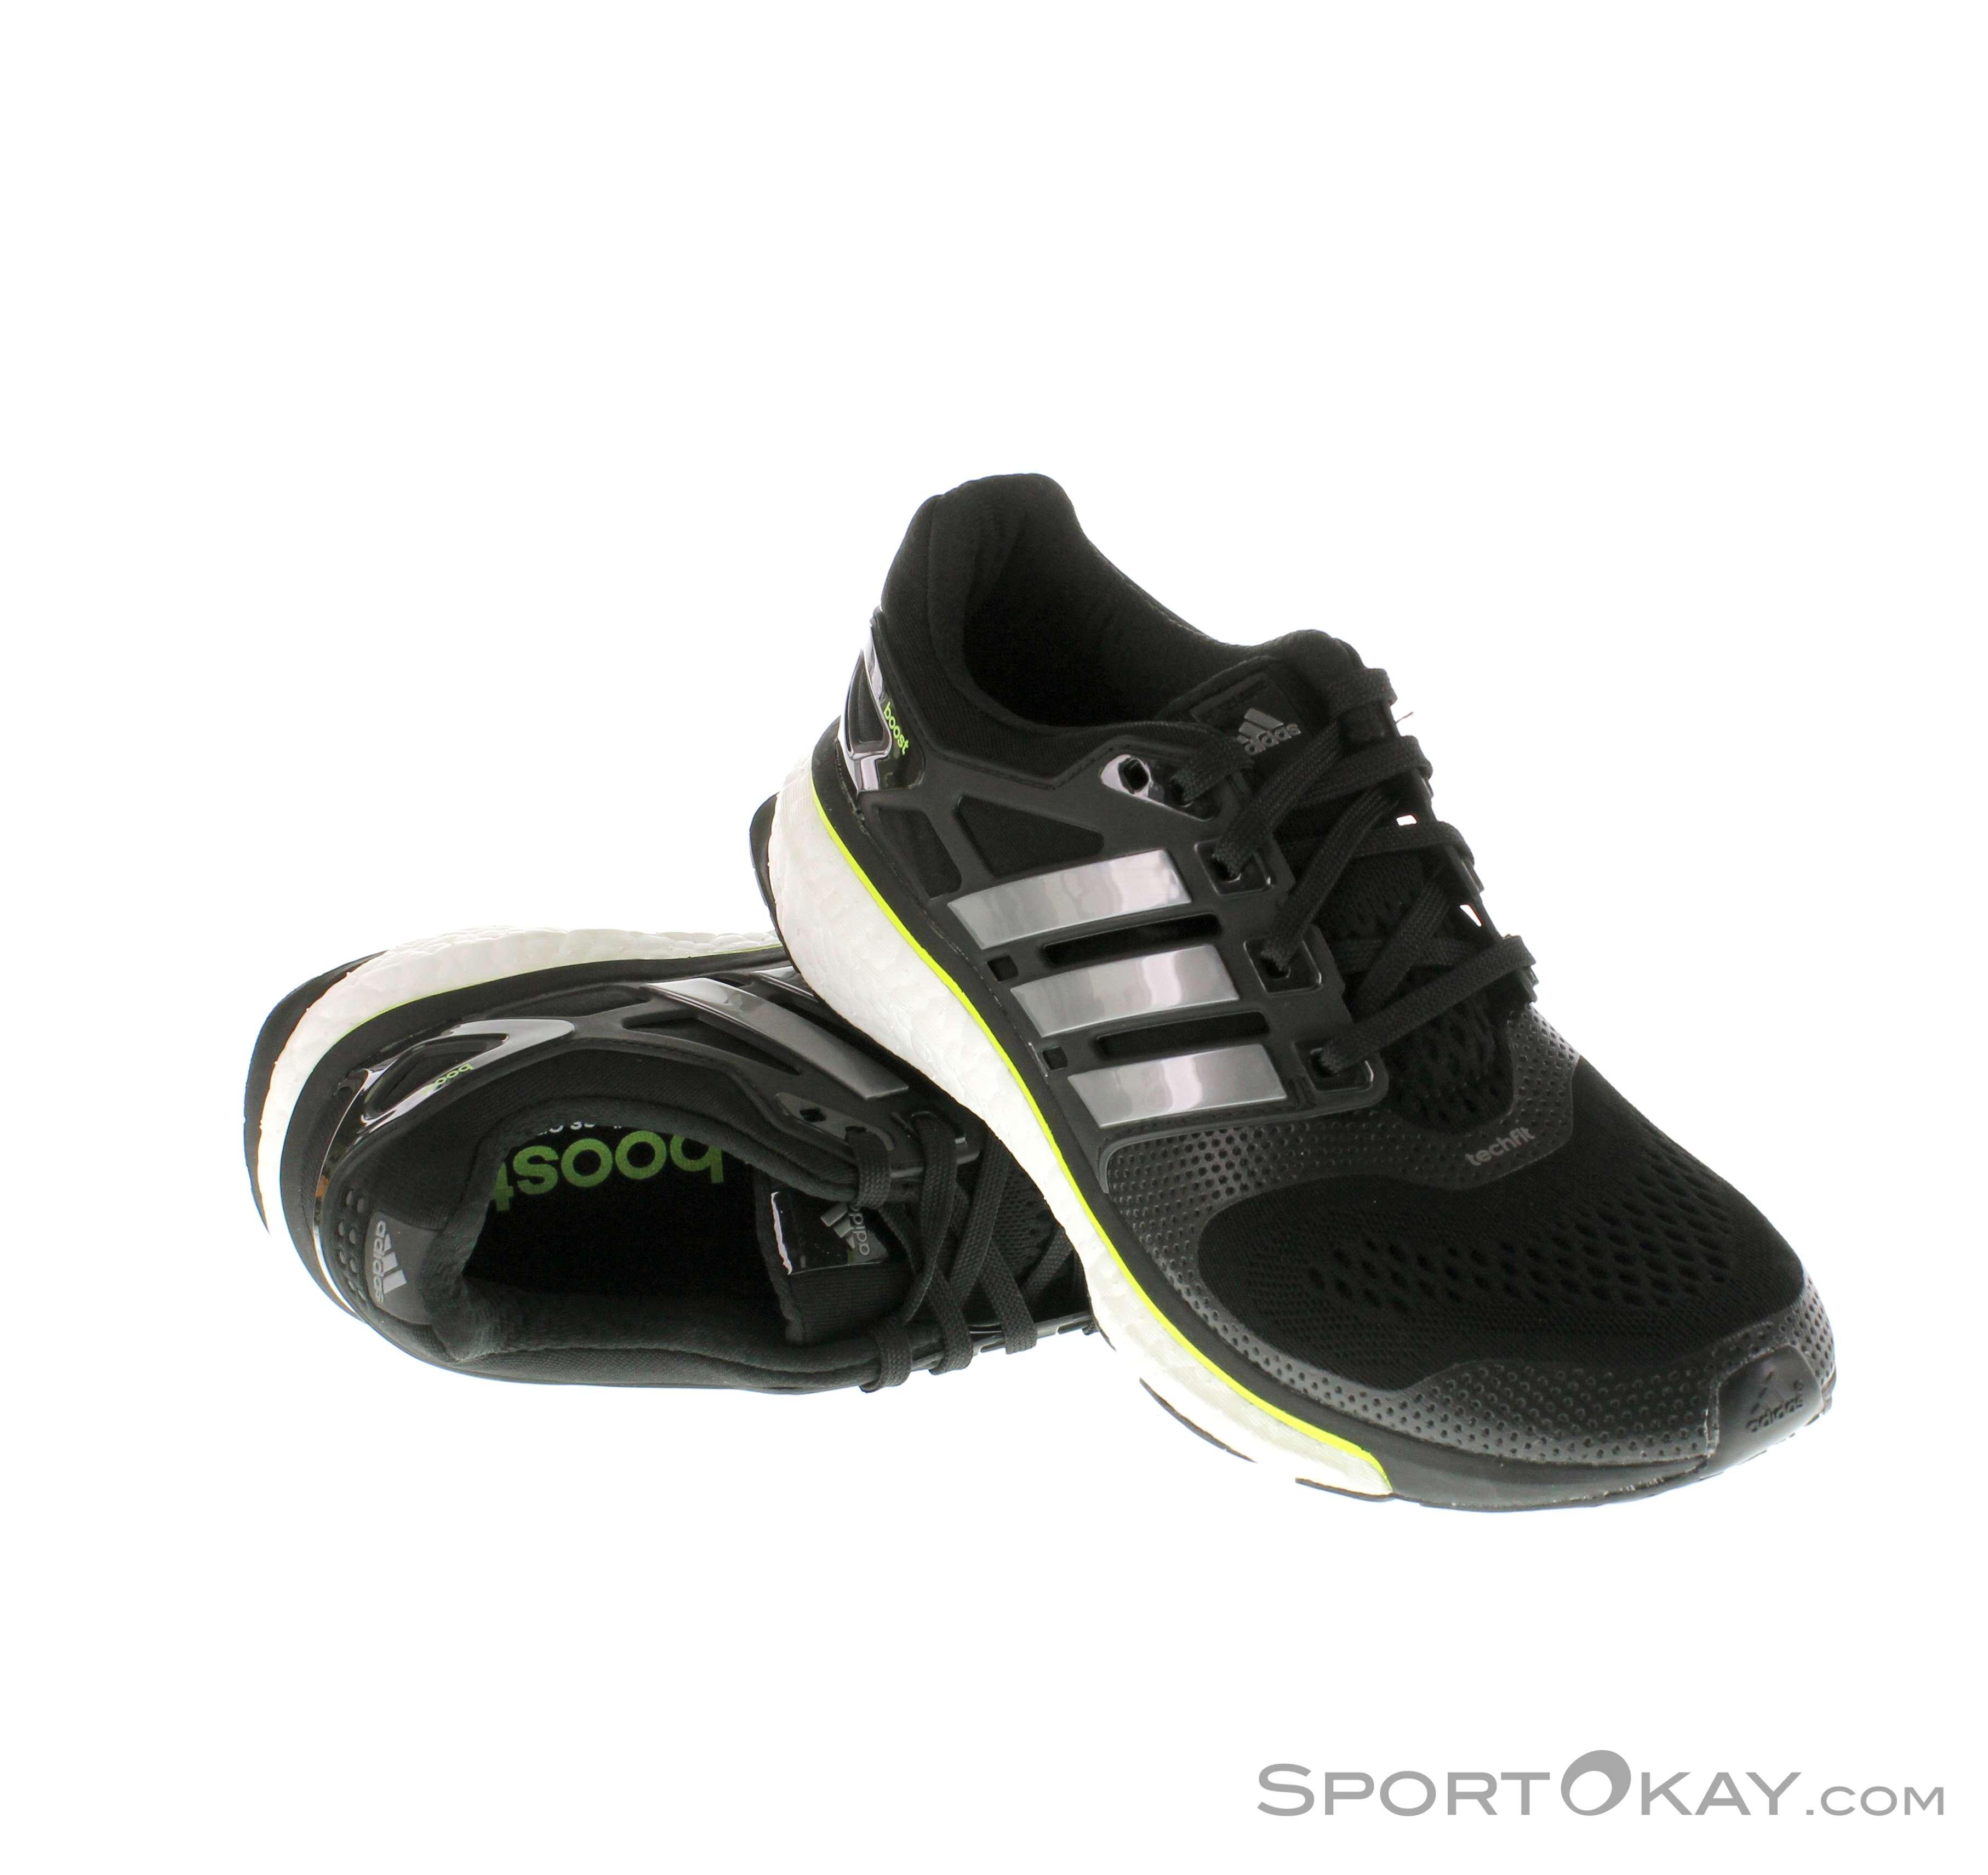 Damen adidas | RESPONSE BOOST 2 Laufschuhe Damen | schwarz